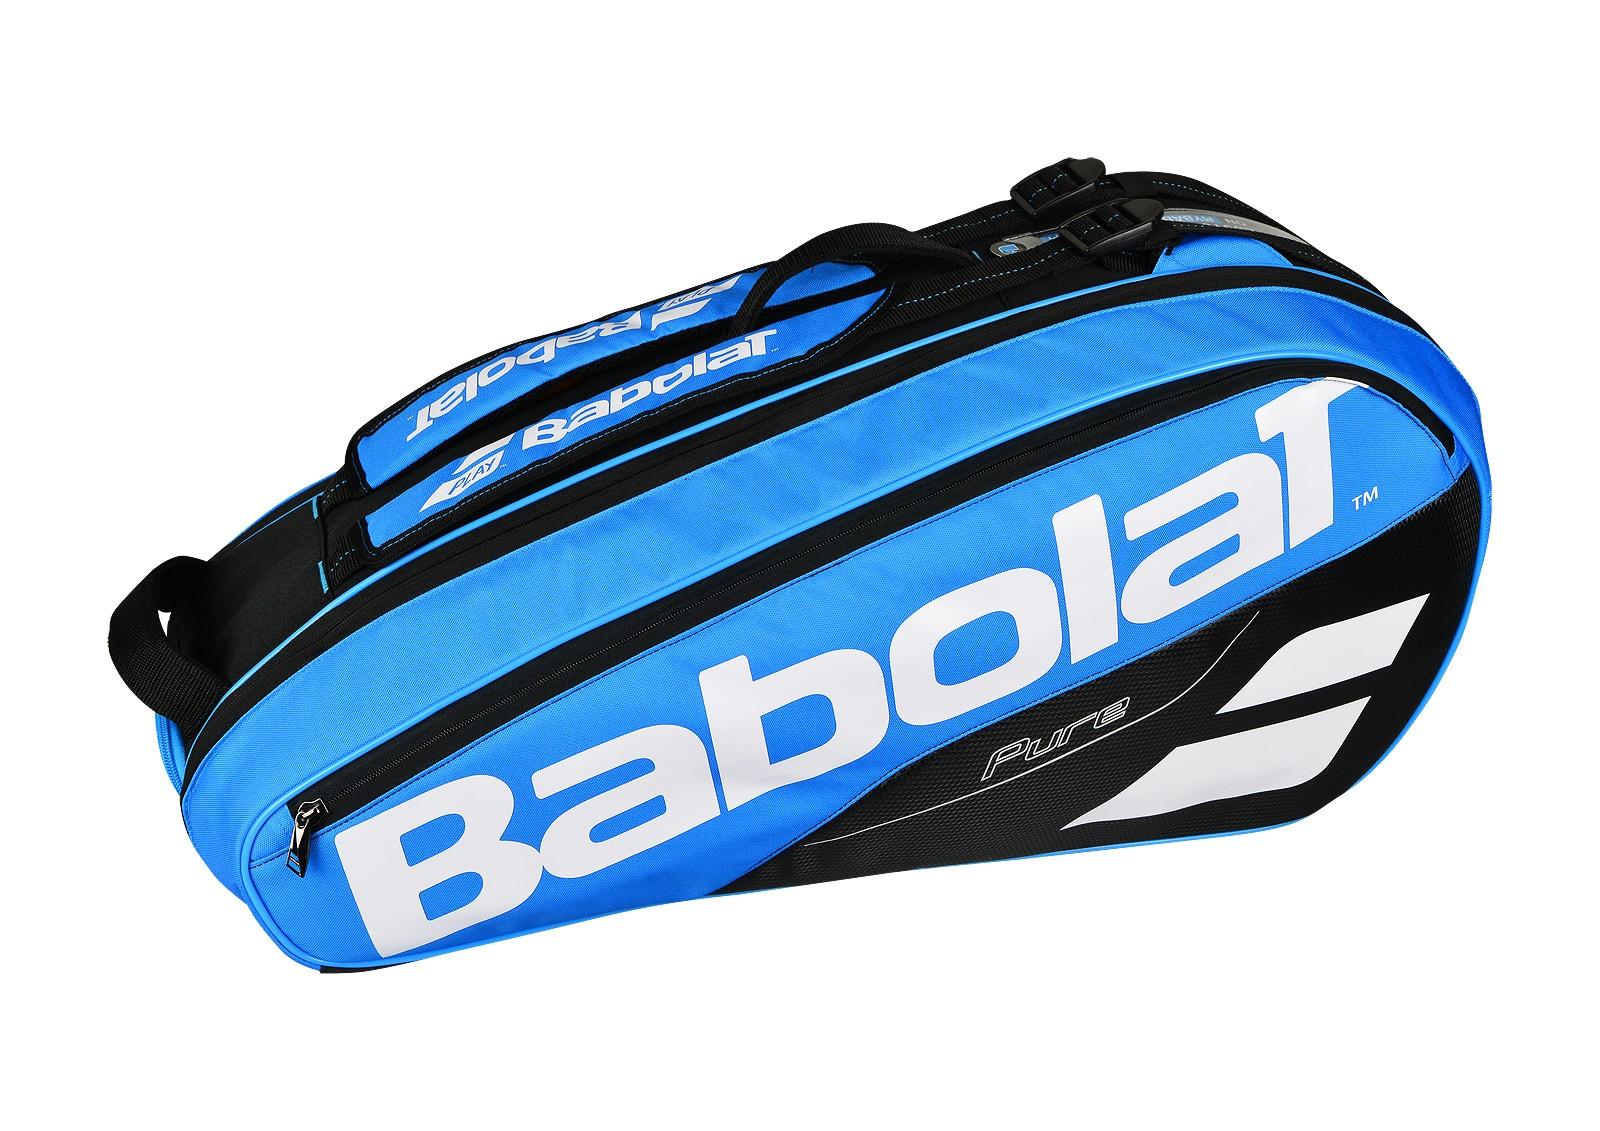 Torba tenisowa Babolat Pure Drive x6